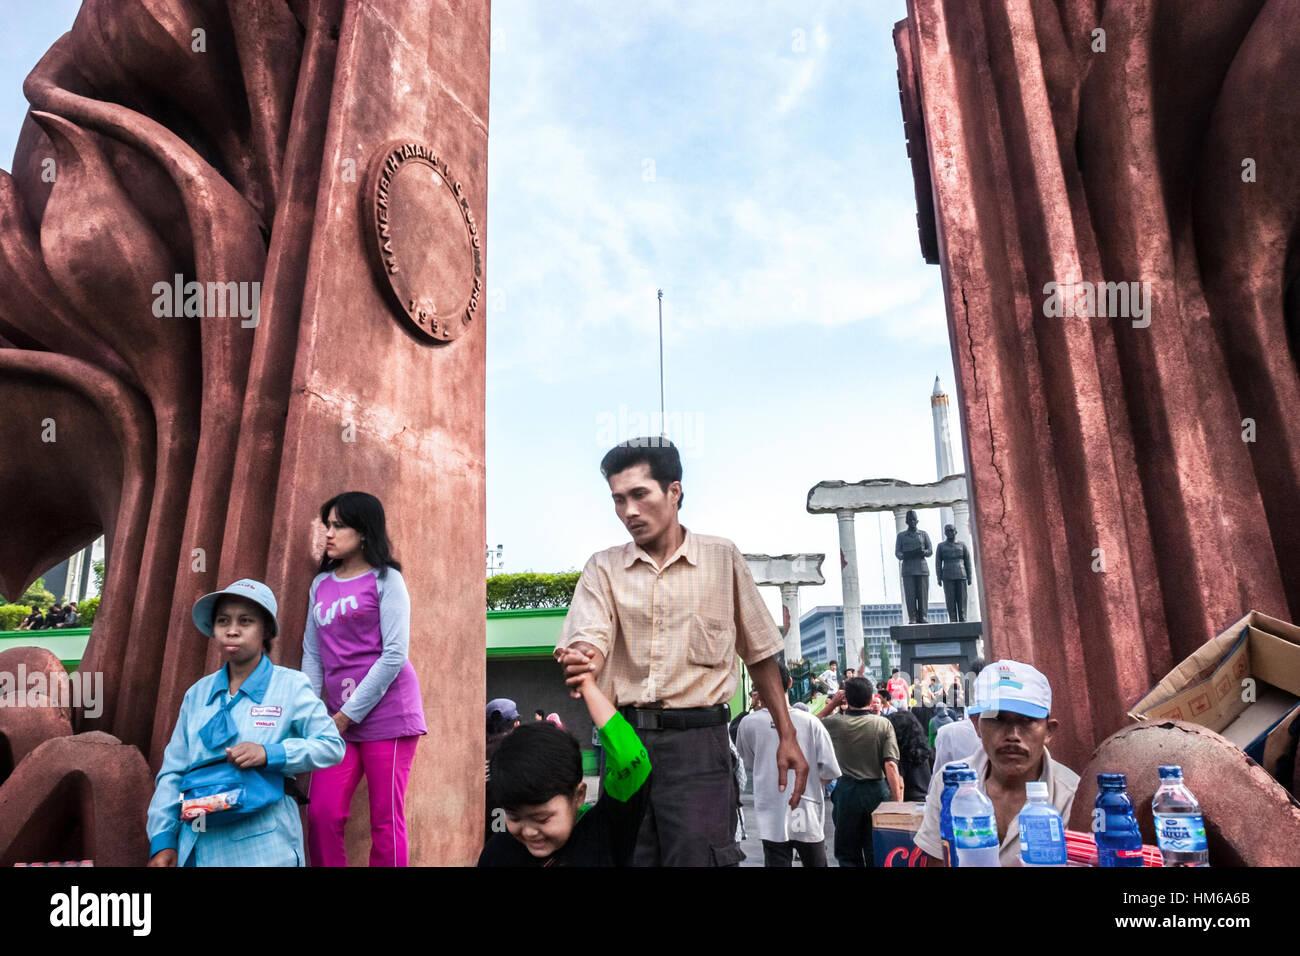 Die Menge an der Pforte des Helden Denkmal in Surabaya wo Soekarno-Hatta Denkmal steht. © Reynold Sumayku Stockbild